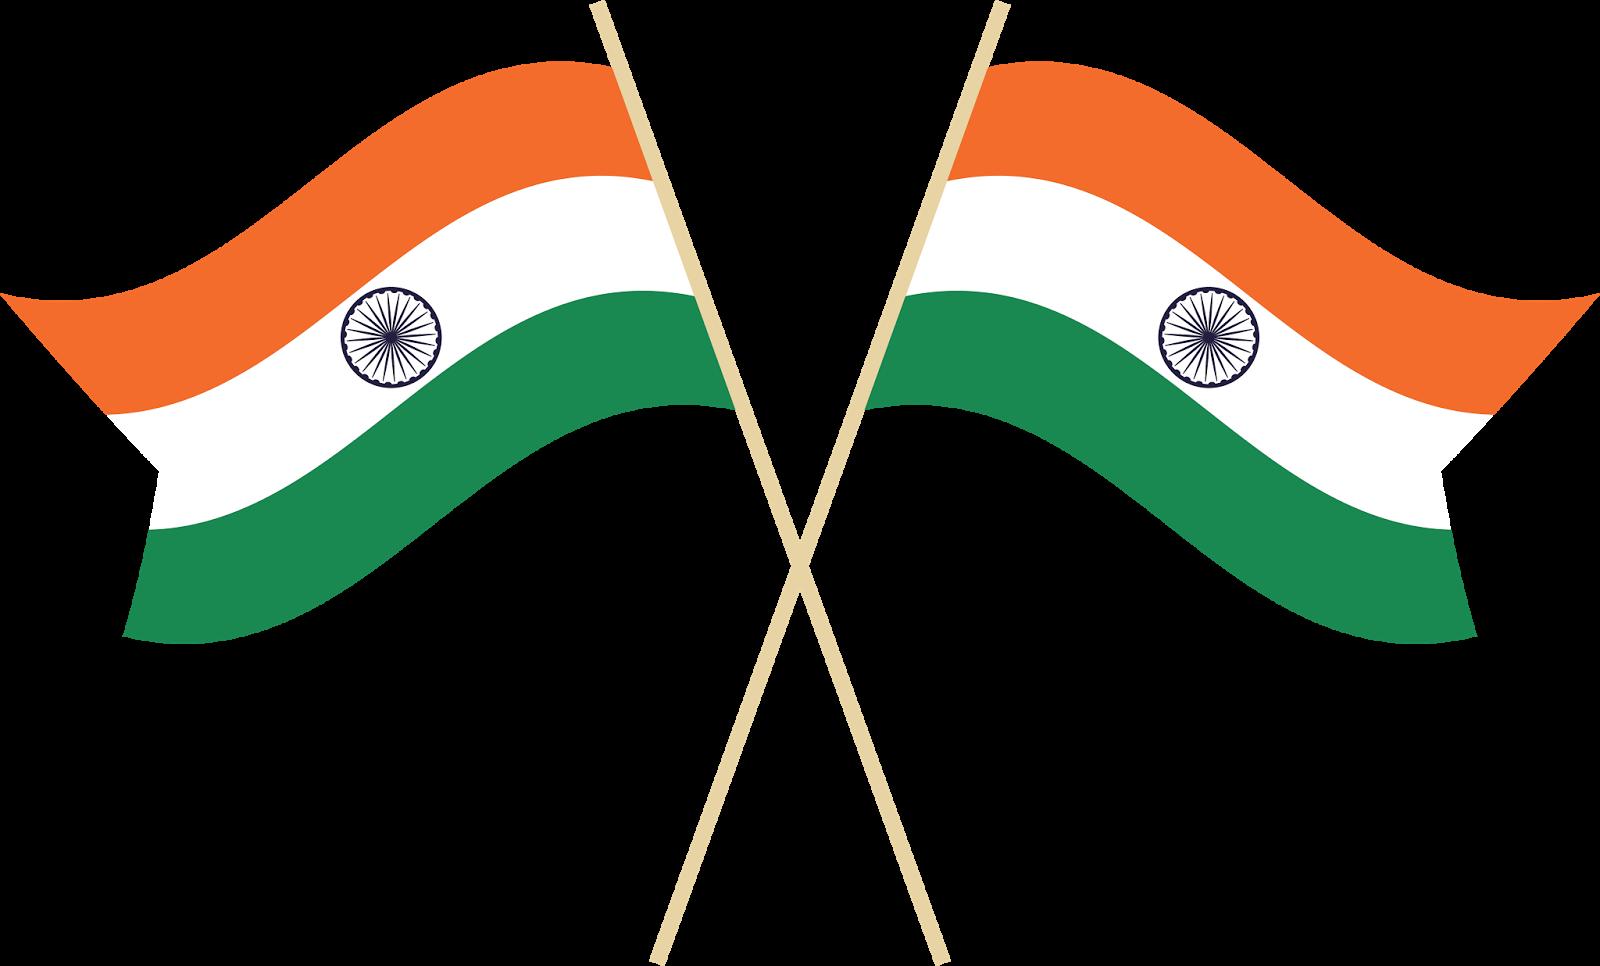 Indians clipart sad. Indian flag png vector